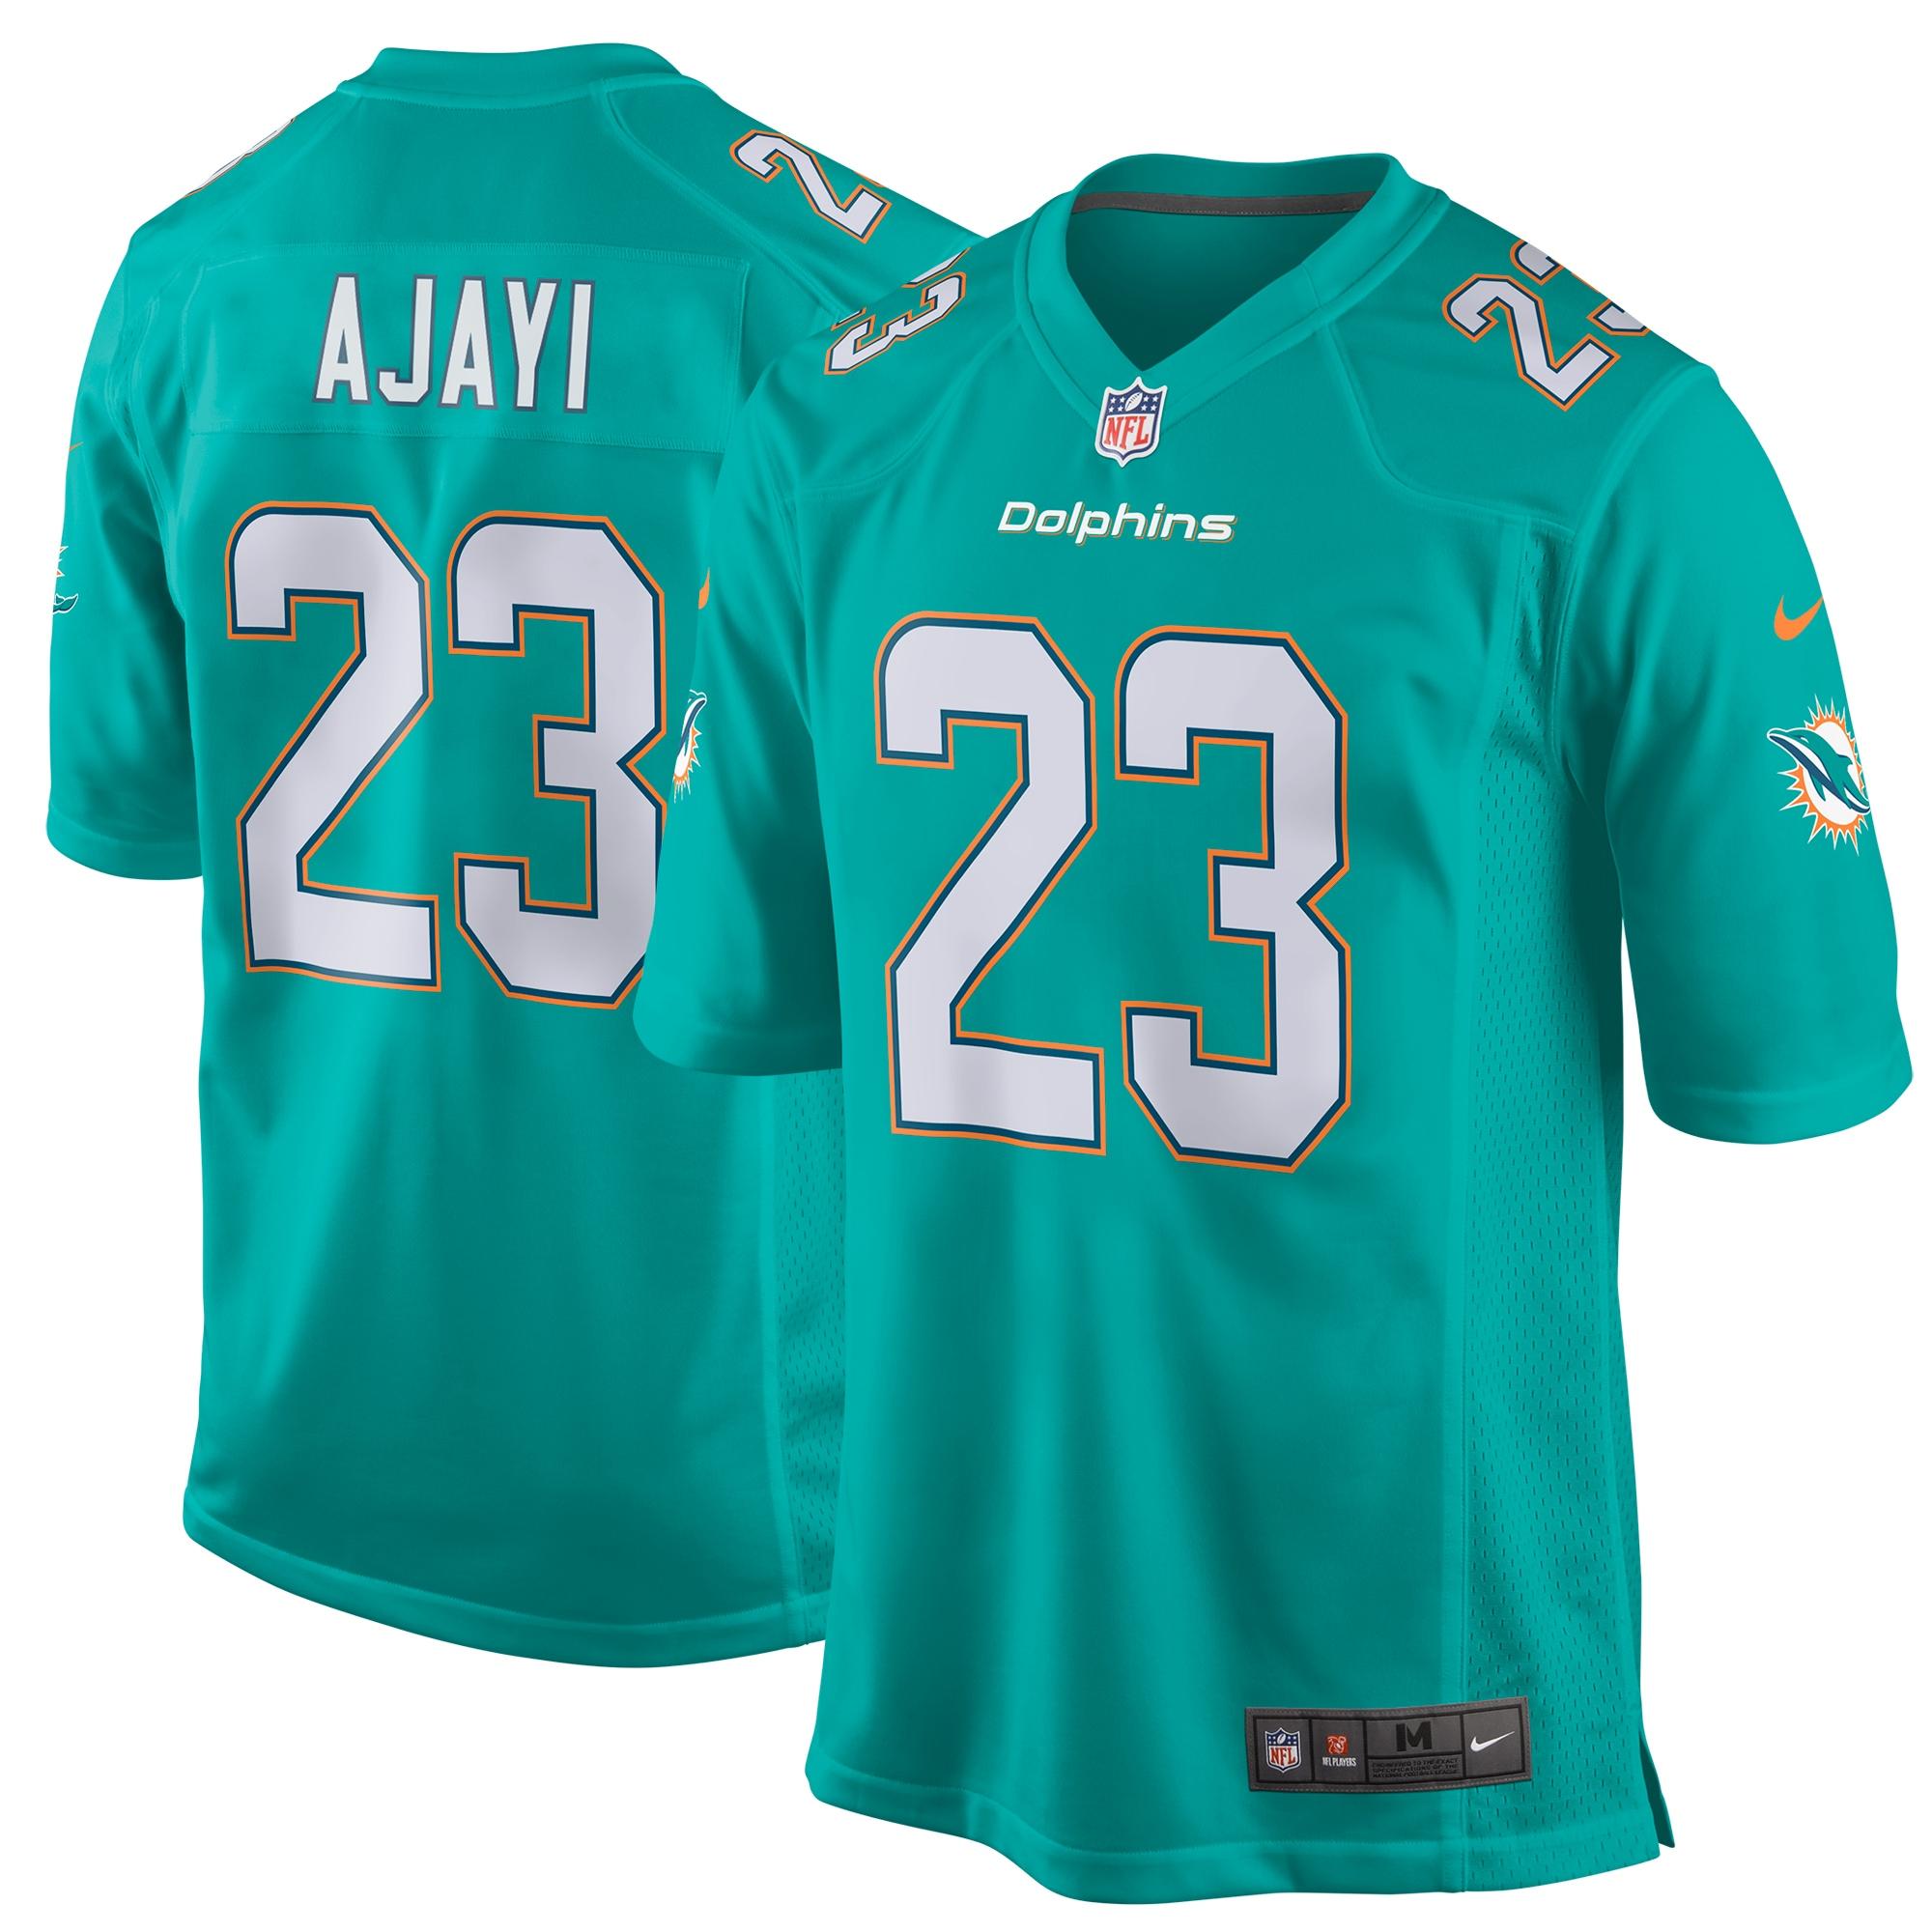 Jay Ajayi Miami Dolphins Nike Game Jersey - Aqua